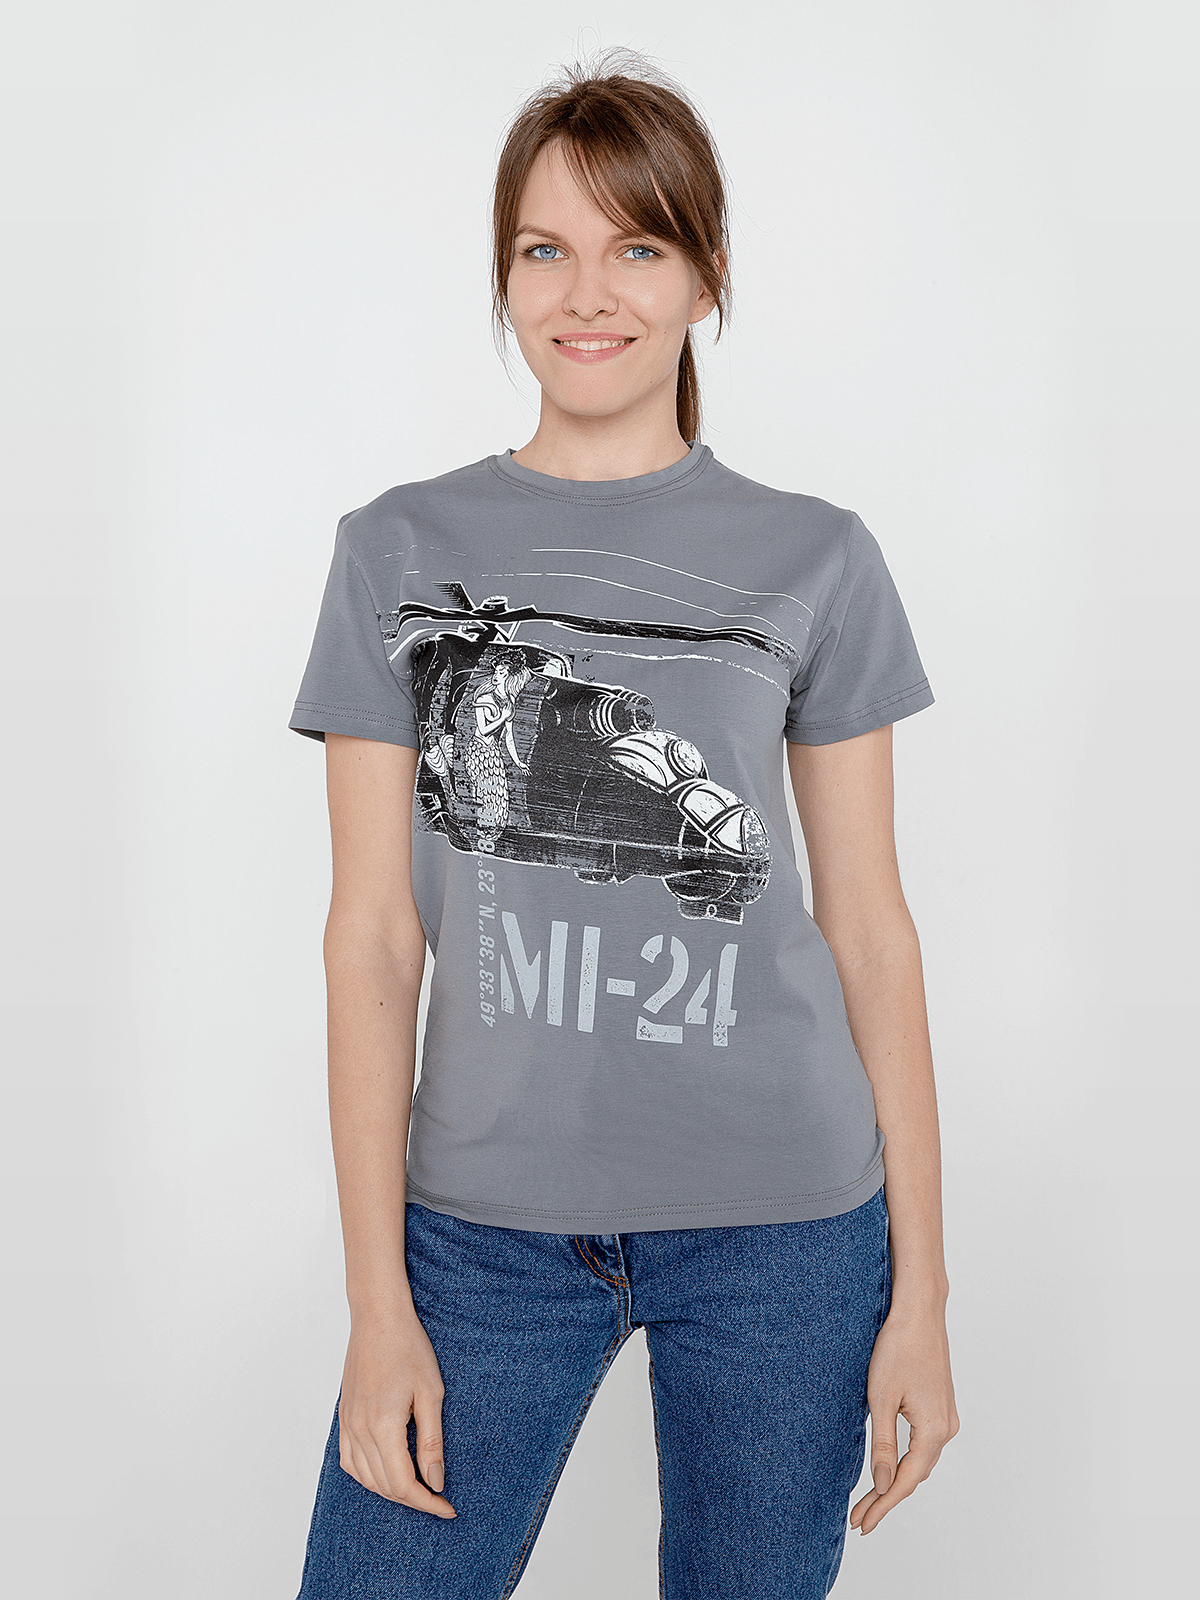 Women's T-Shirt Мі-24. Color gray. Material: 95% cotton, 5% spandex.